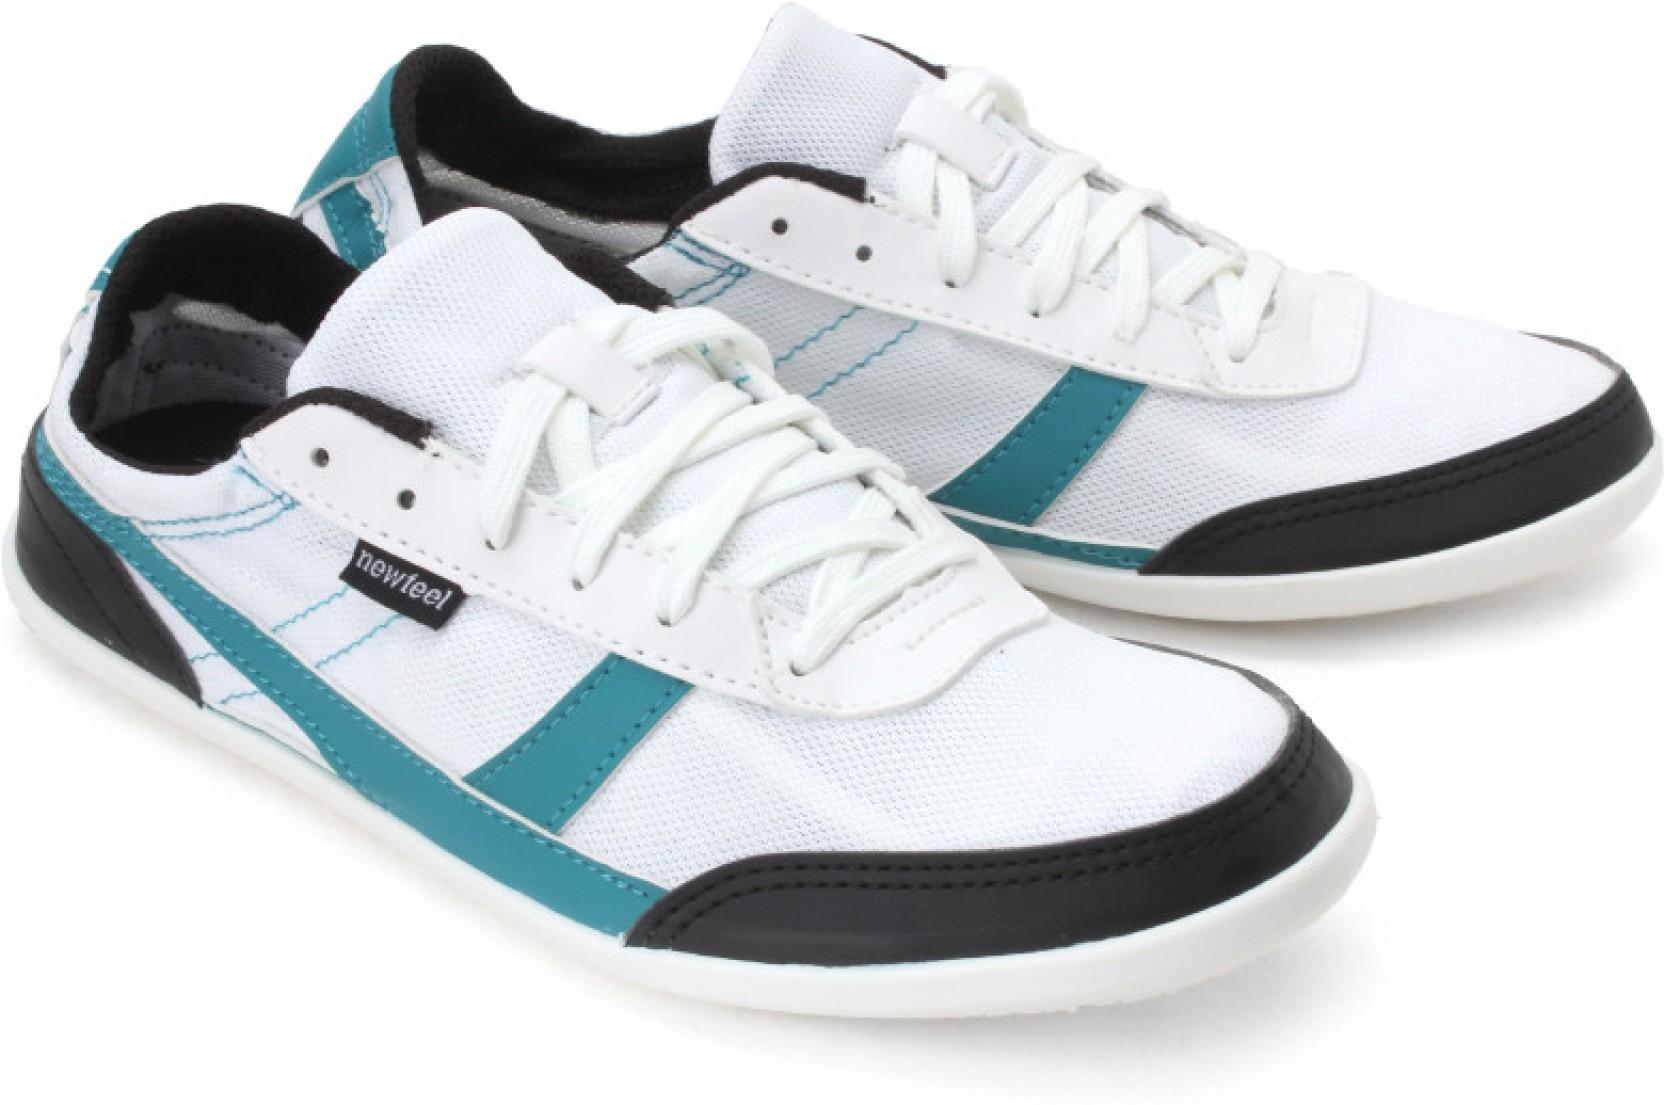 Where Can I Buy Cushion Walk Shoes